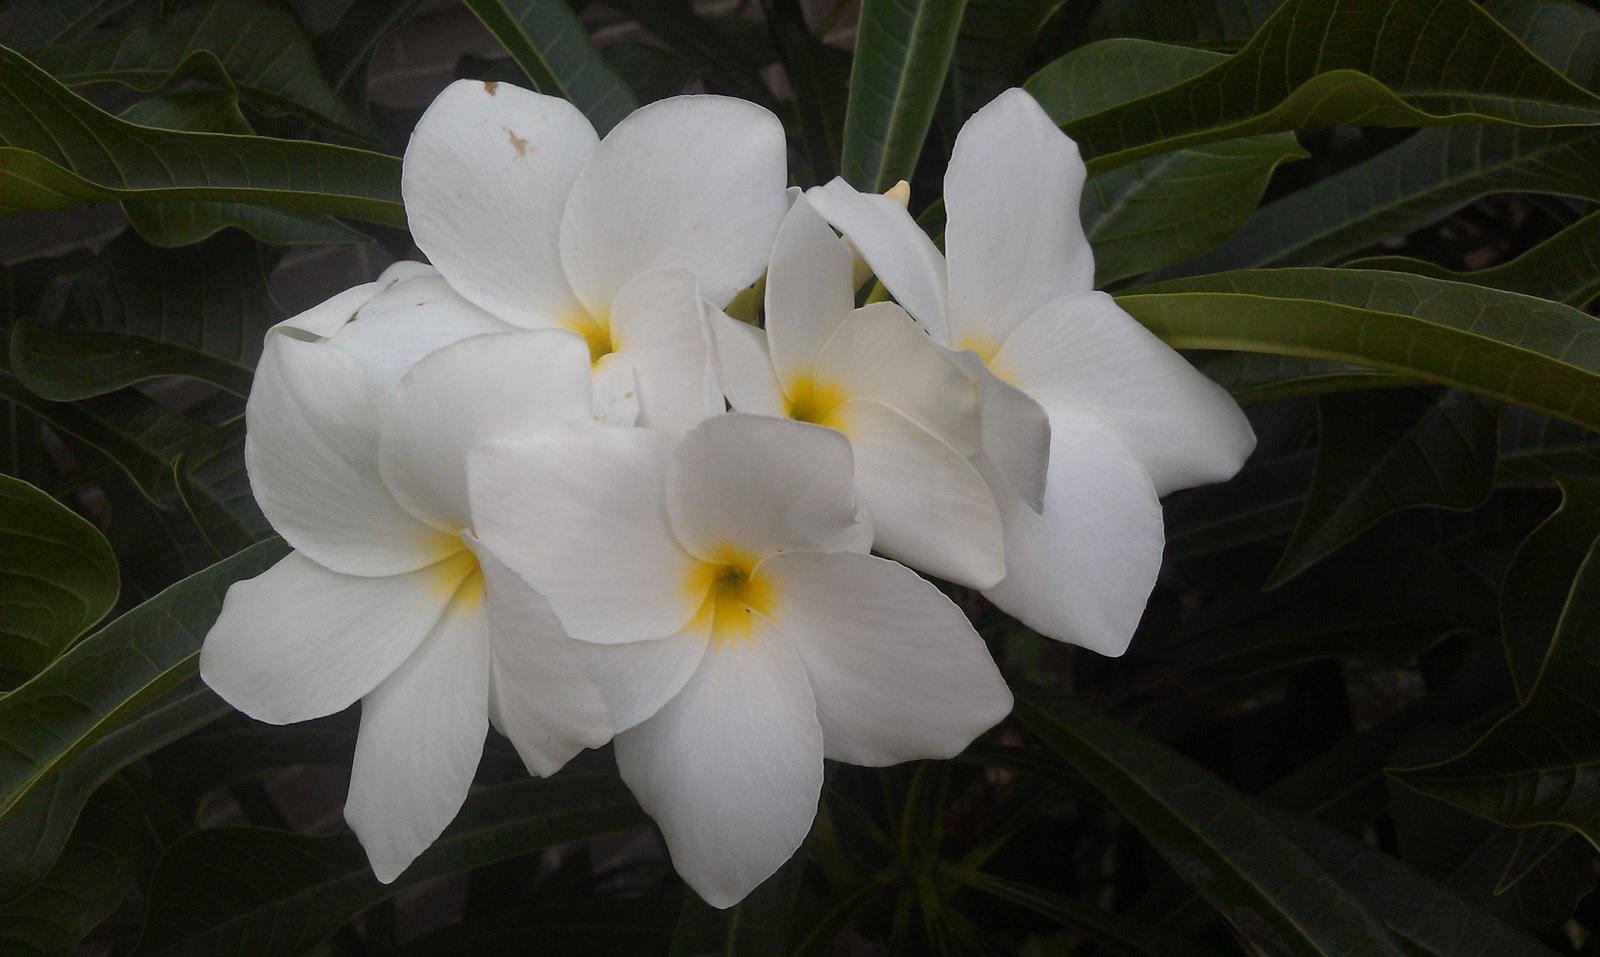 Plant Photography: Plumeria pudica White Frangipani